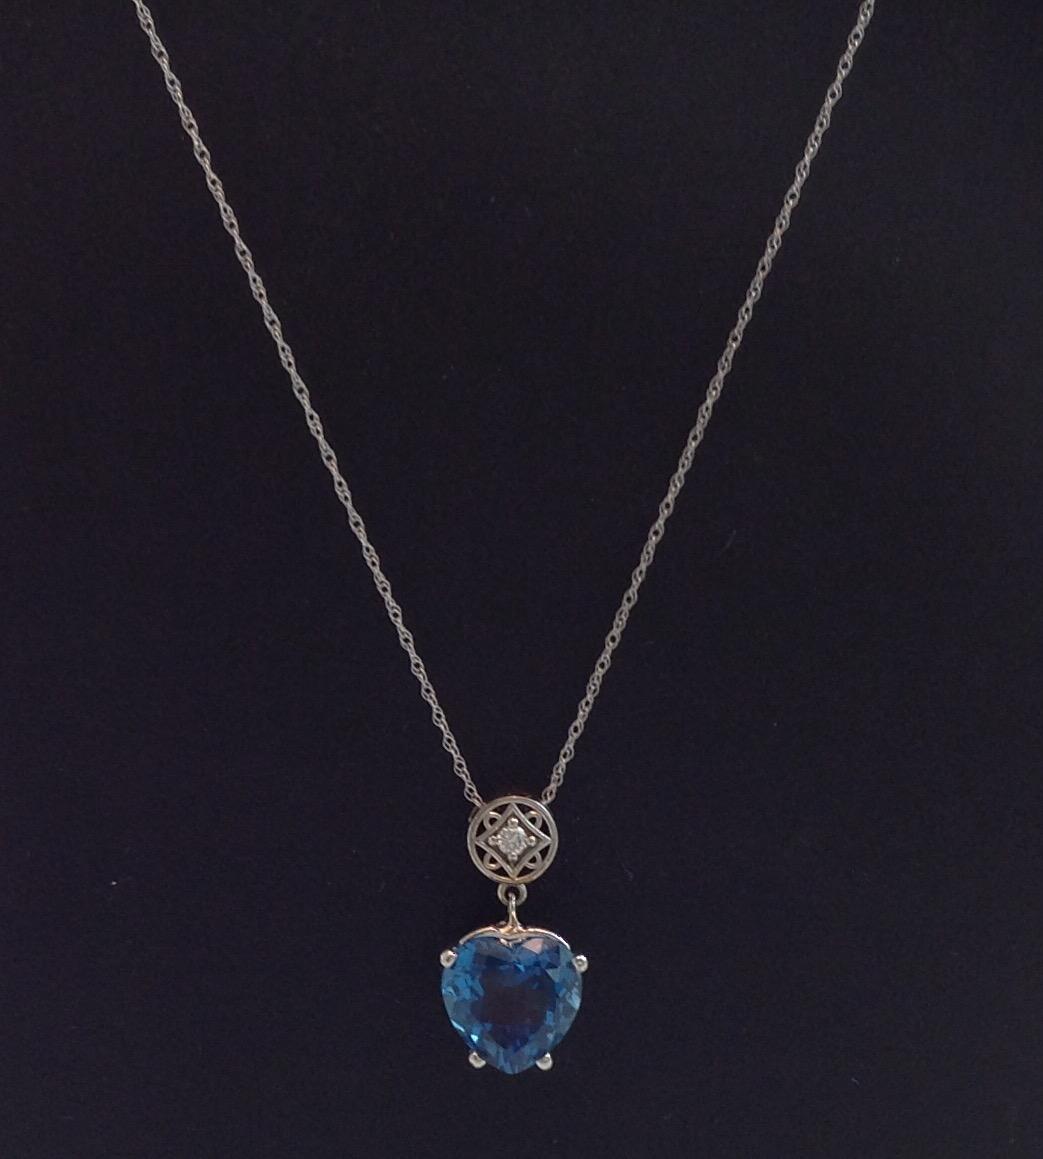 Heart Shape Blue Topaz Pendant